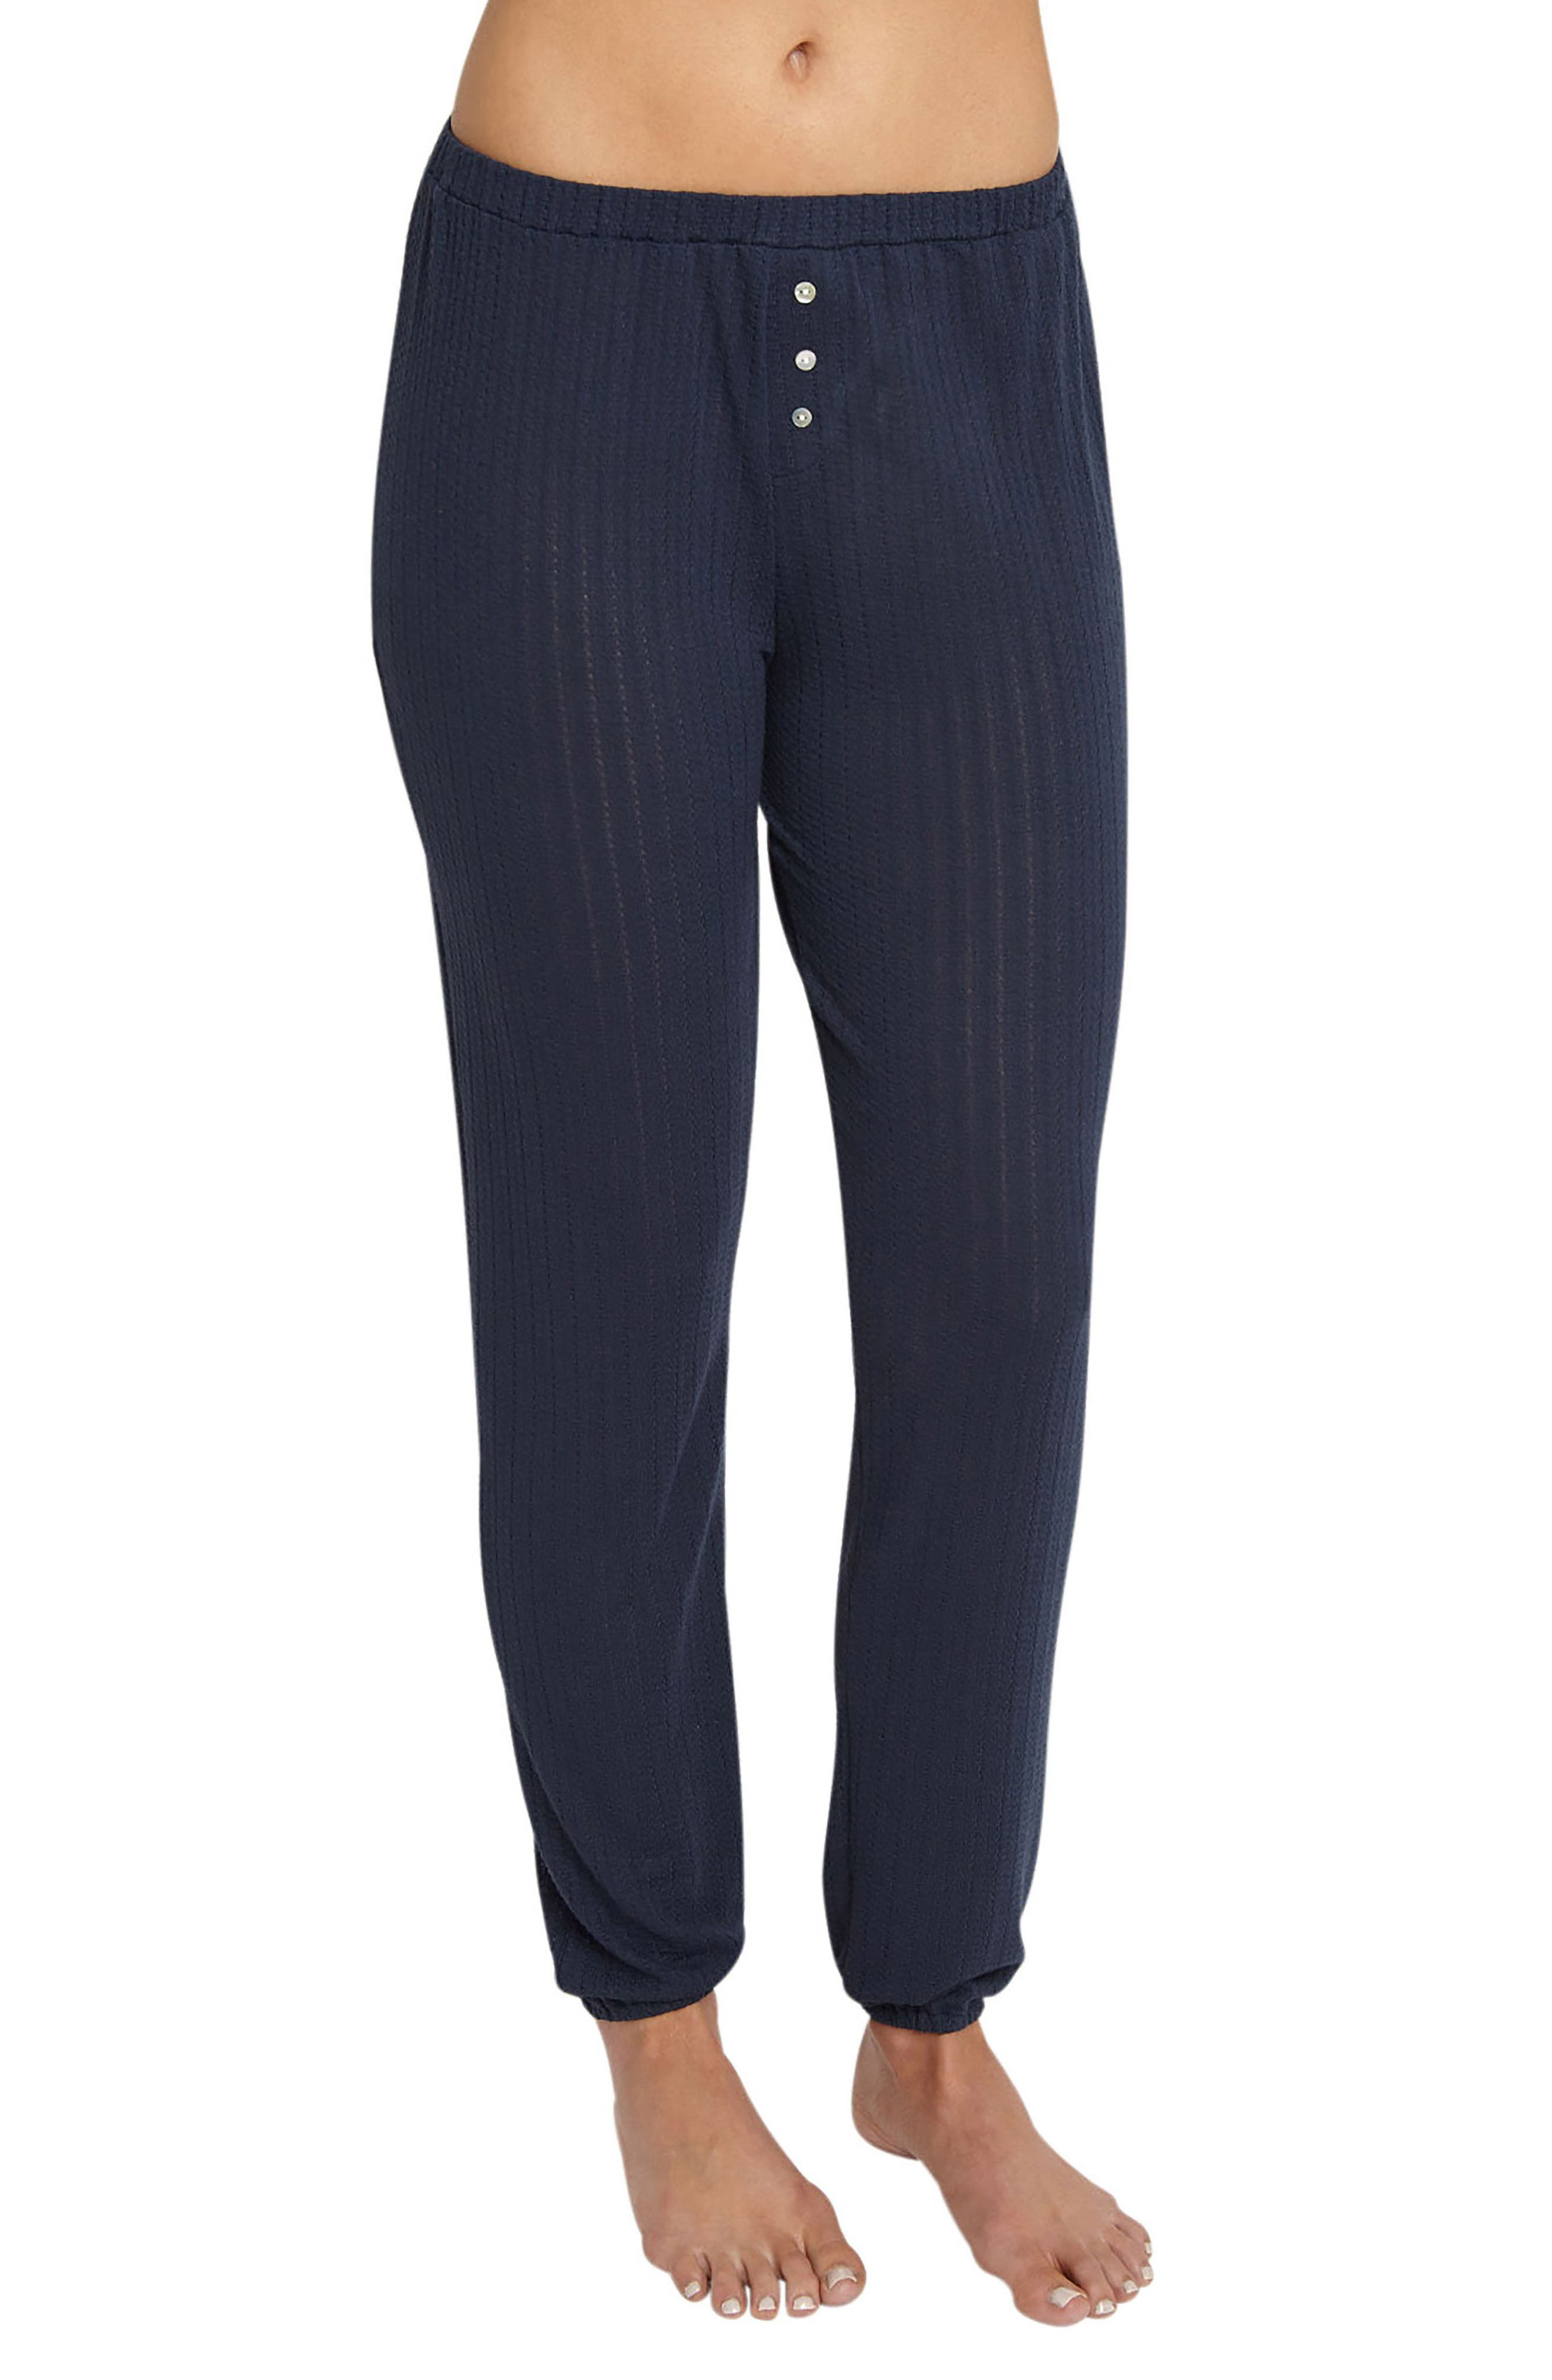 Eberjey Blue Nights Baxter Pants